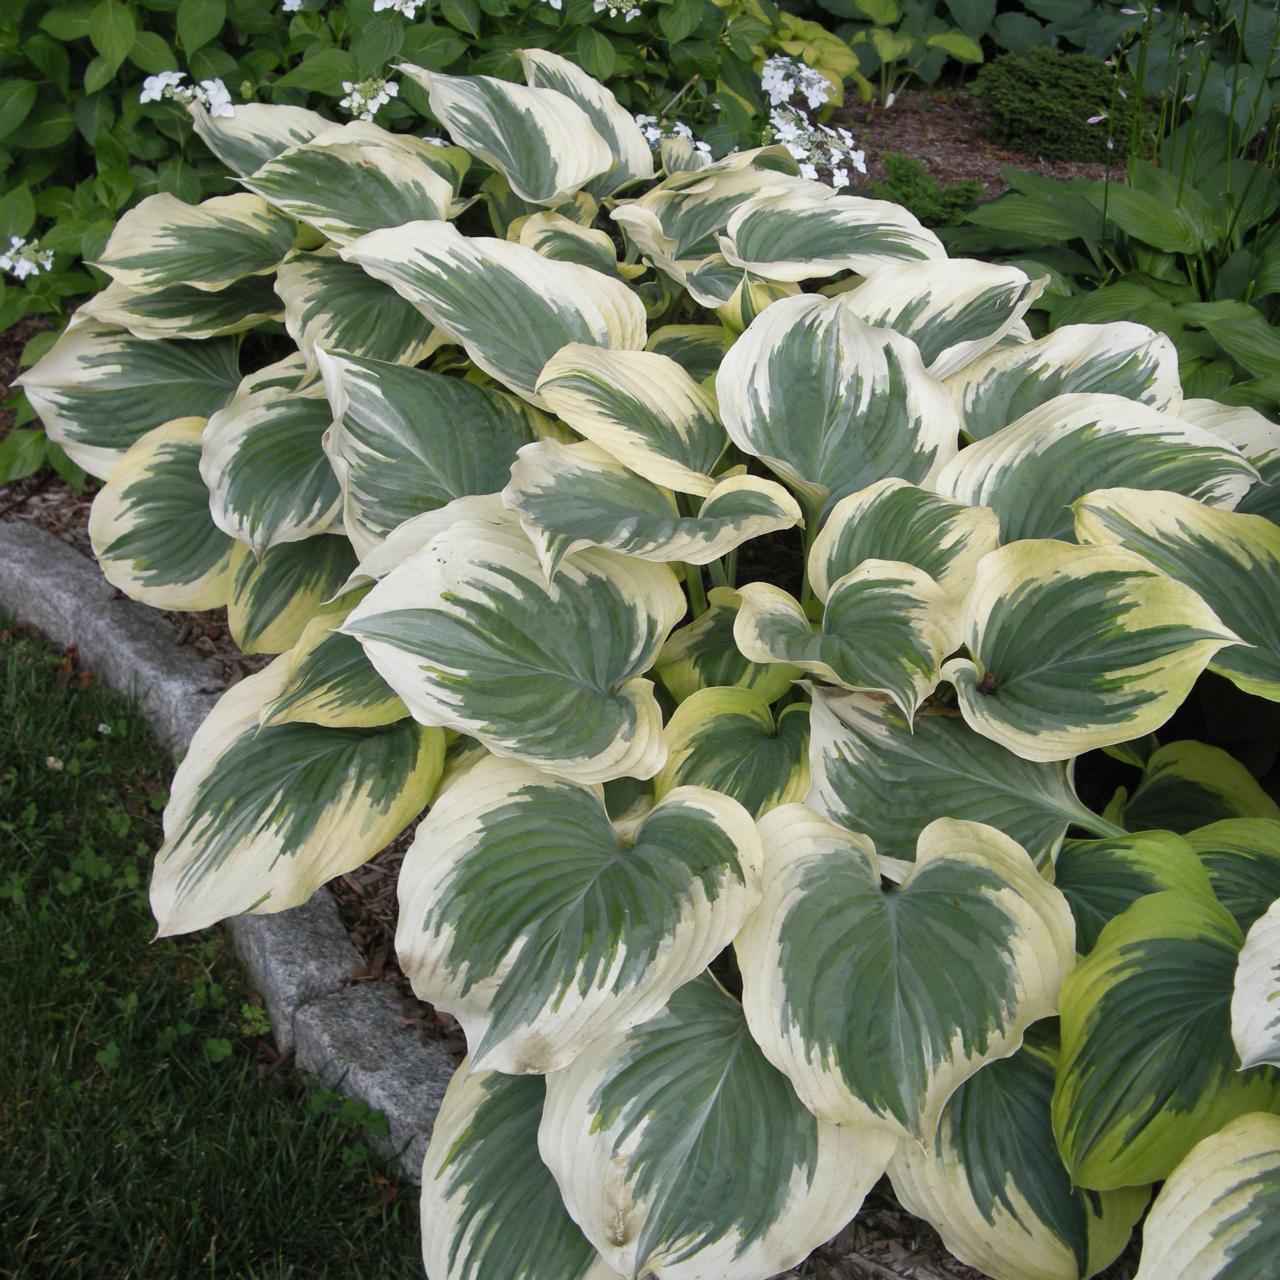 Hosta 'Victory' plant